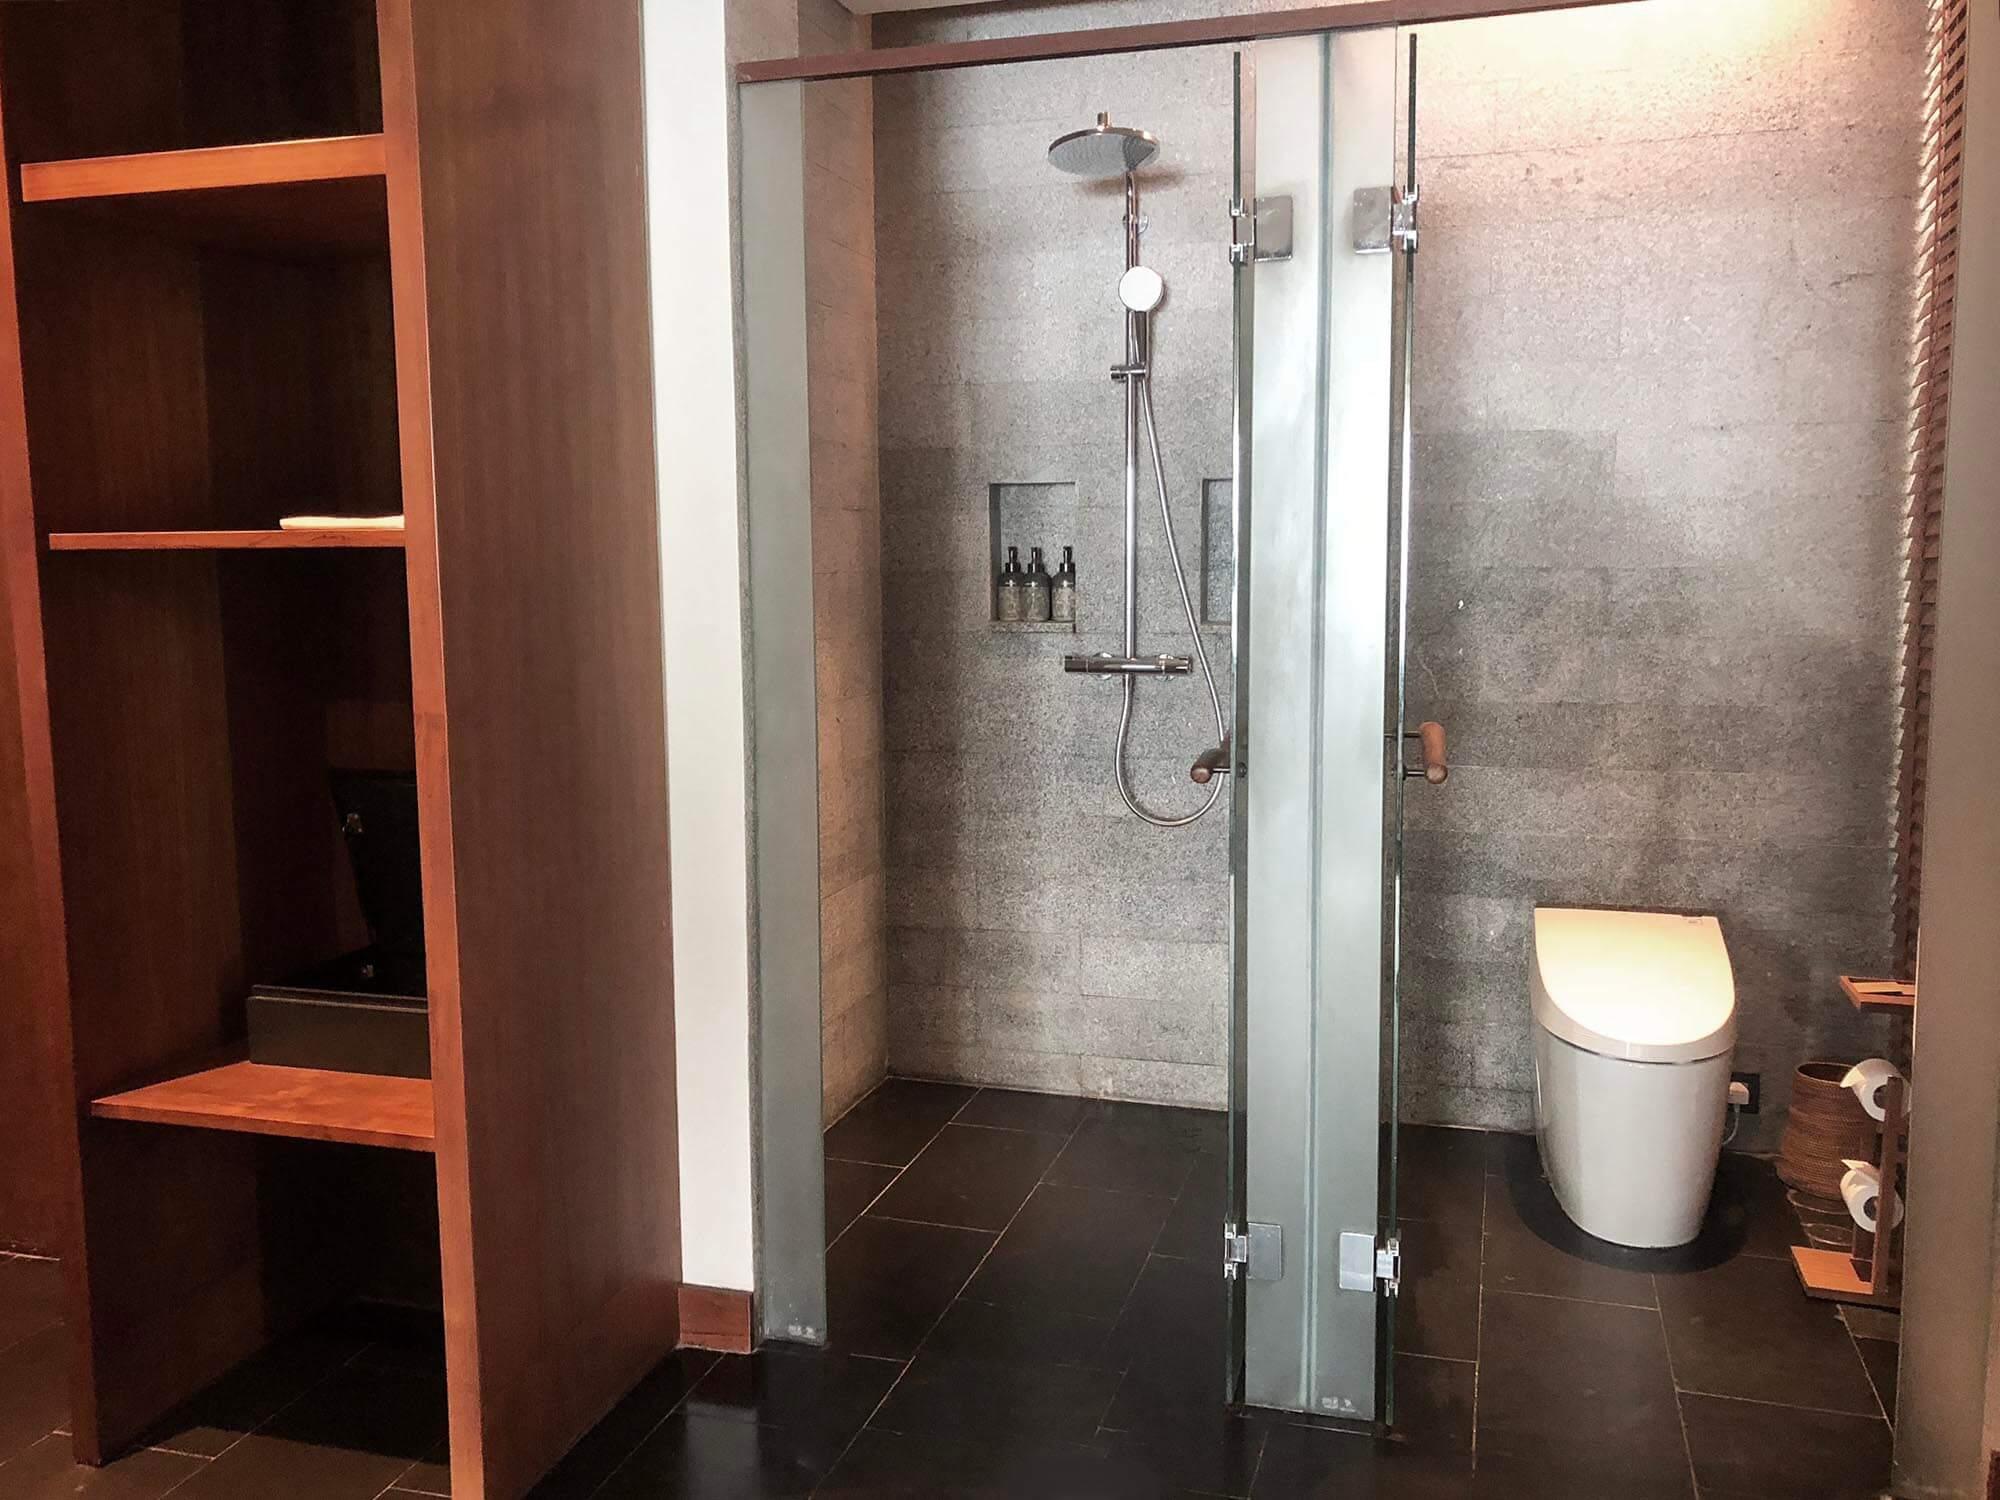 sixsense_uluwatu_skysuite_廁所